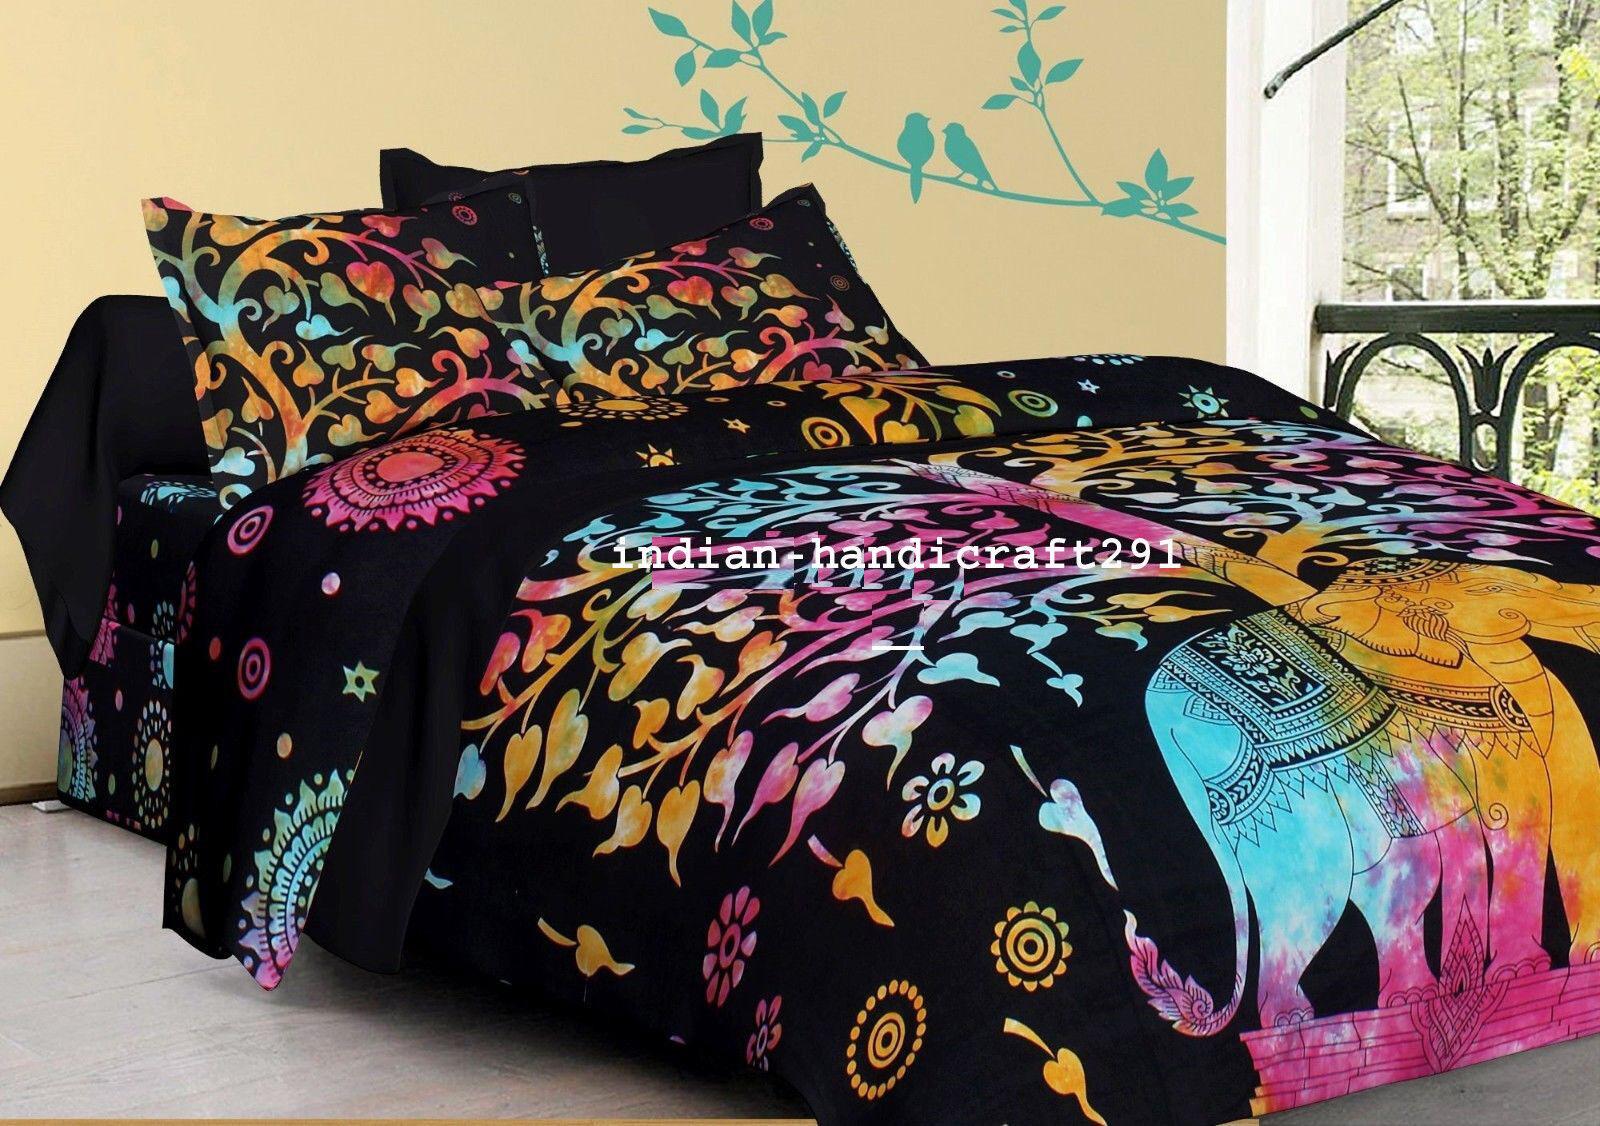 Single Double Queen Size Elephant Mandala Bedding Blanket Quilt Duvet Cover Set